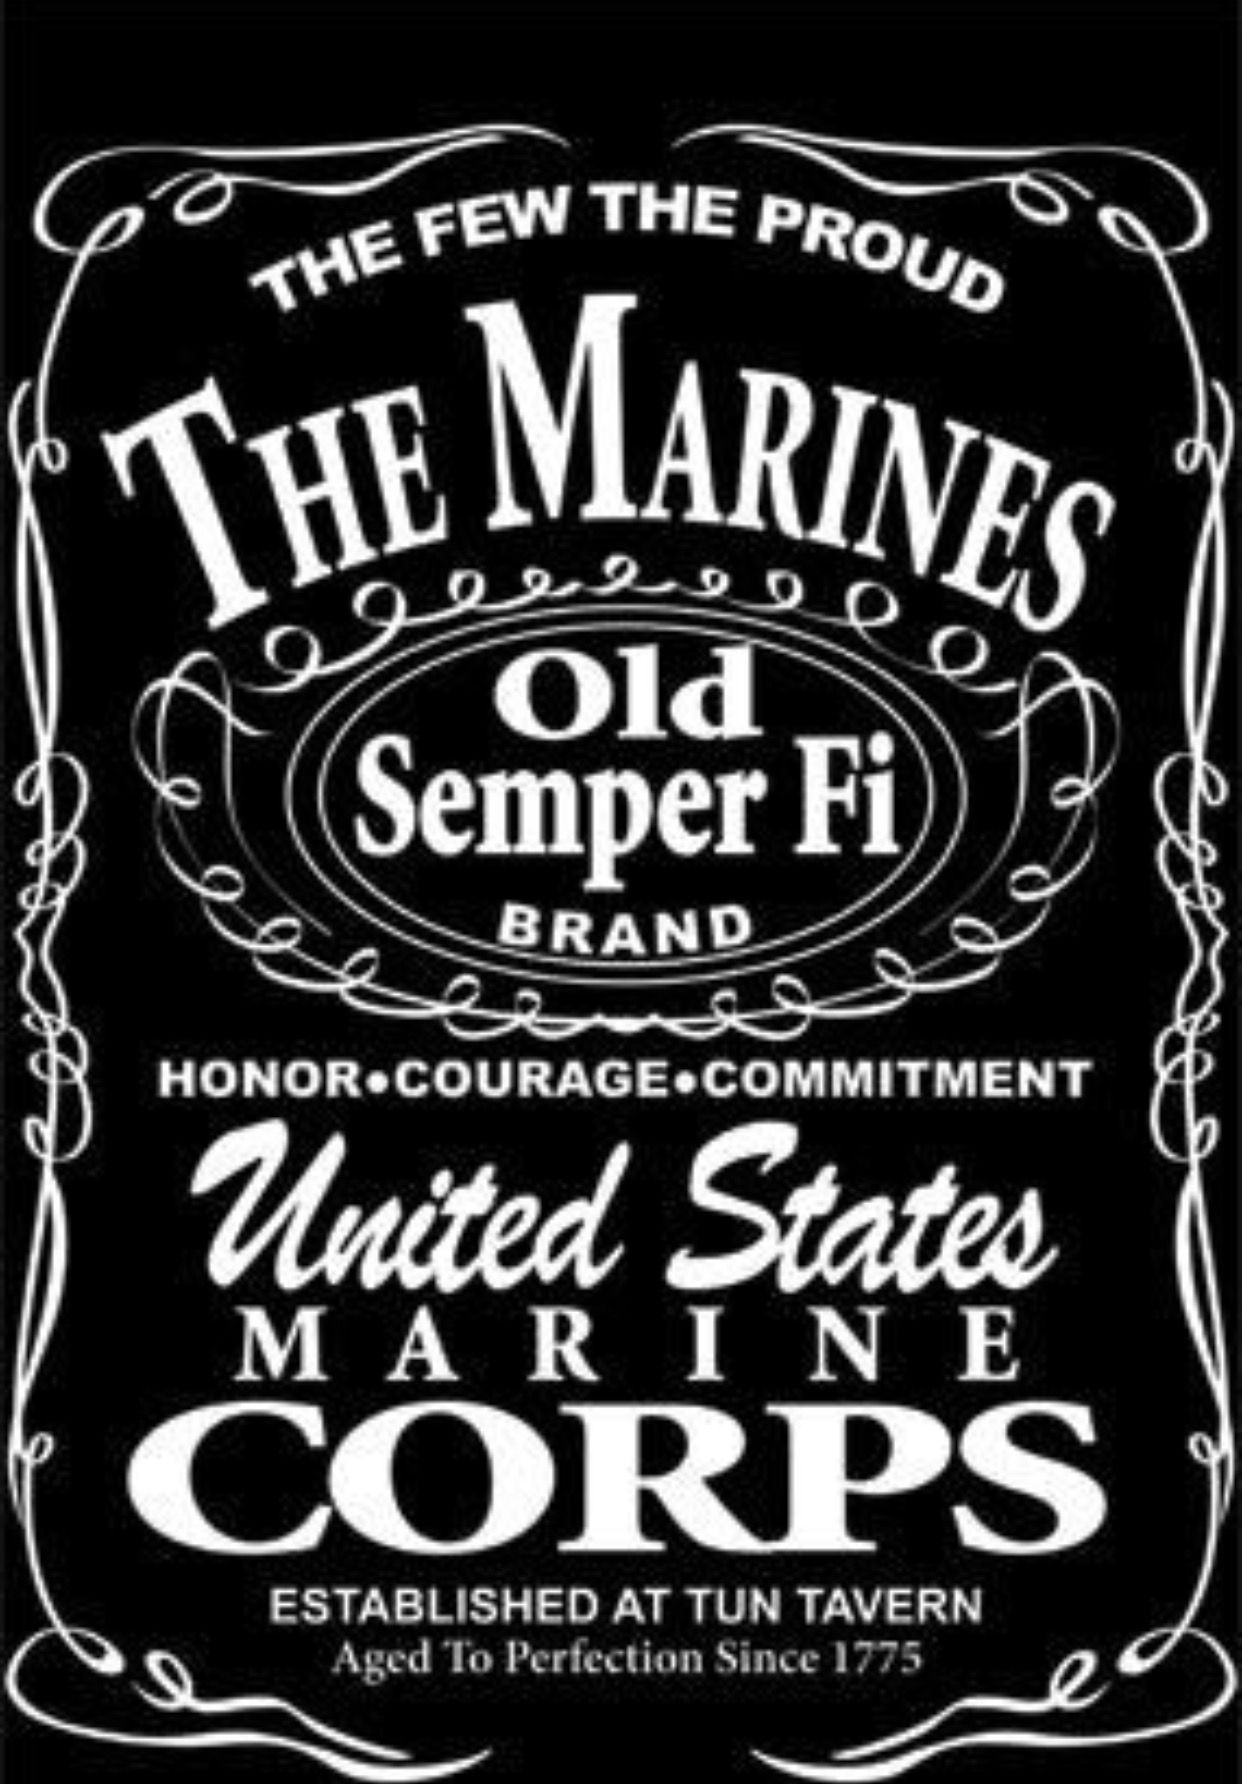 Marine Corps Quotes Pinalvin Yates On Female Marines & Soldiers  Pinterest  Usmc